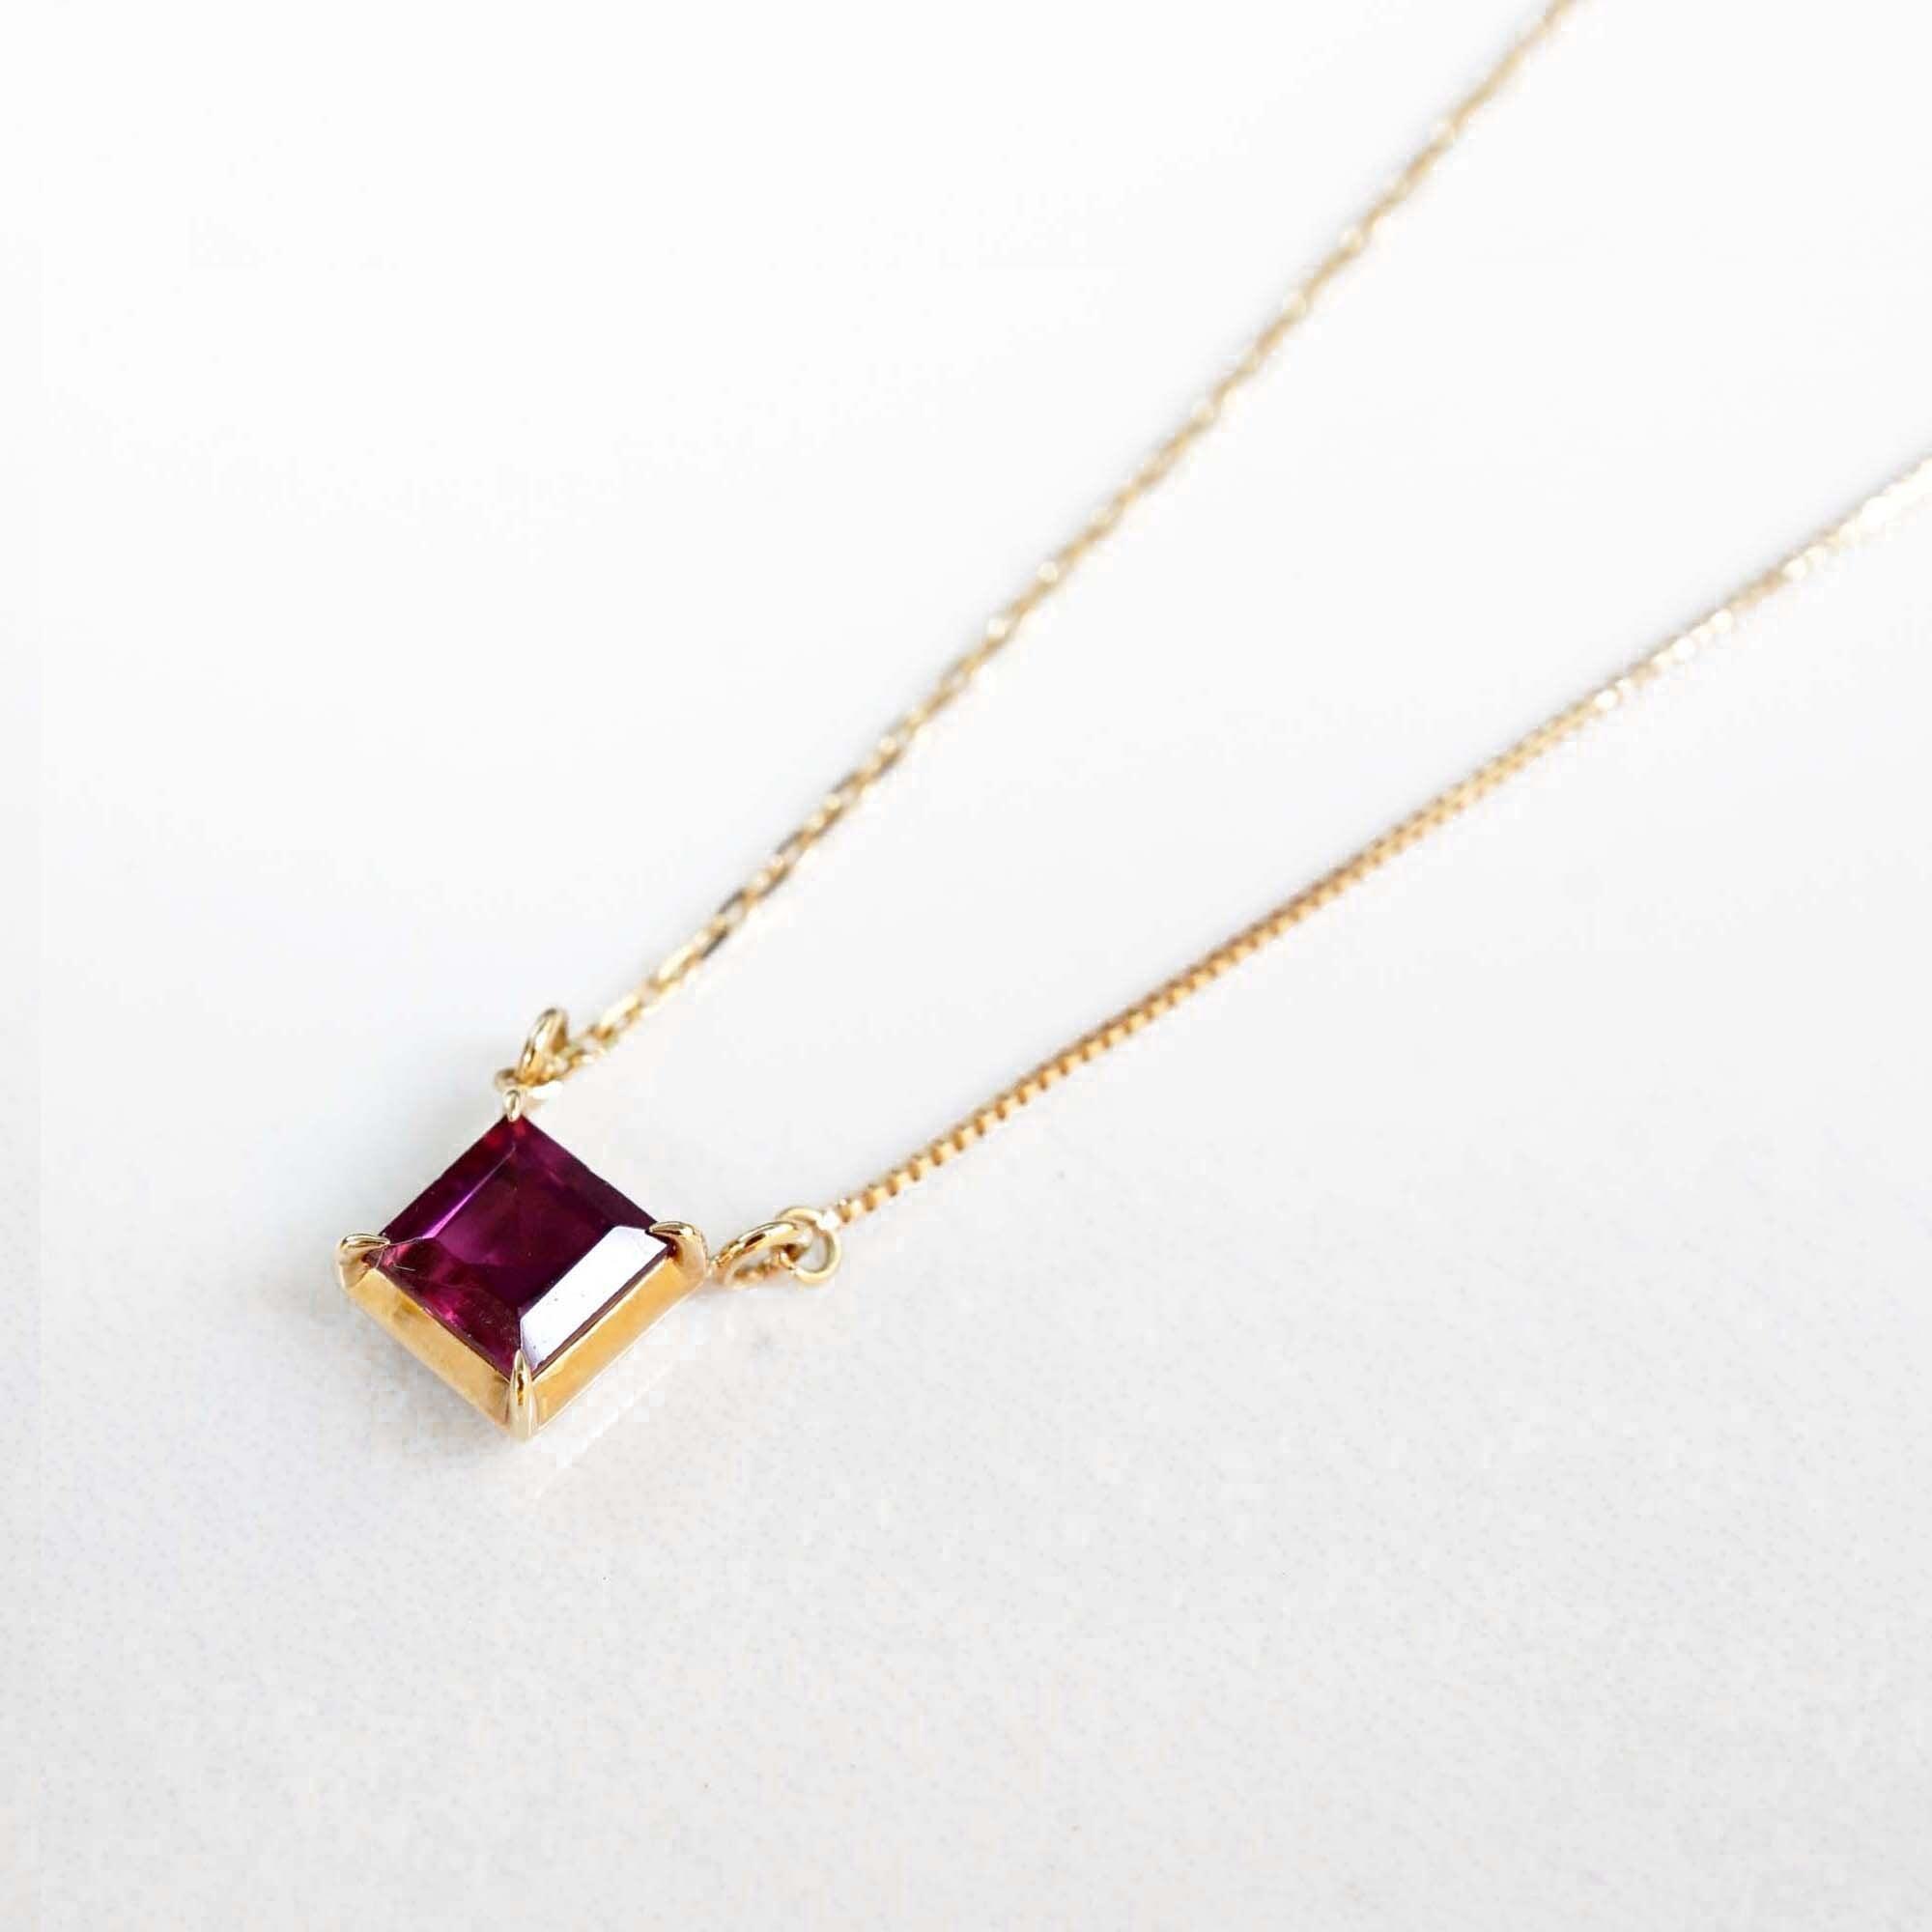 Rhodolite Garnet Necklace(N144-RG)